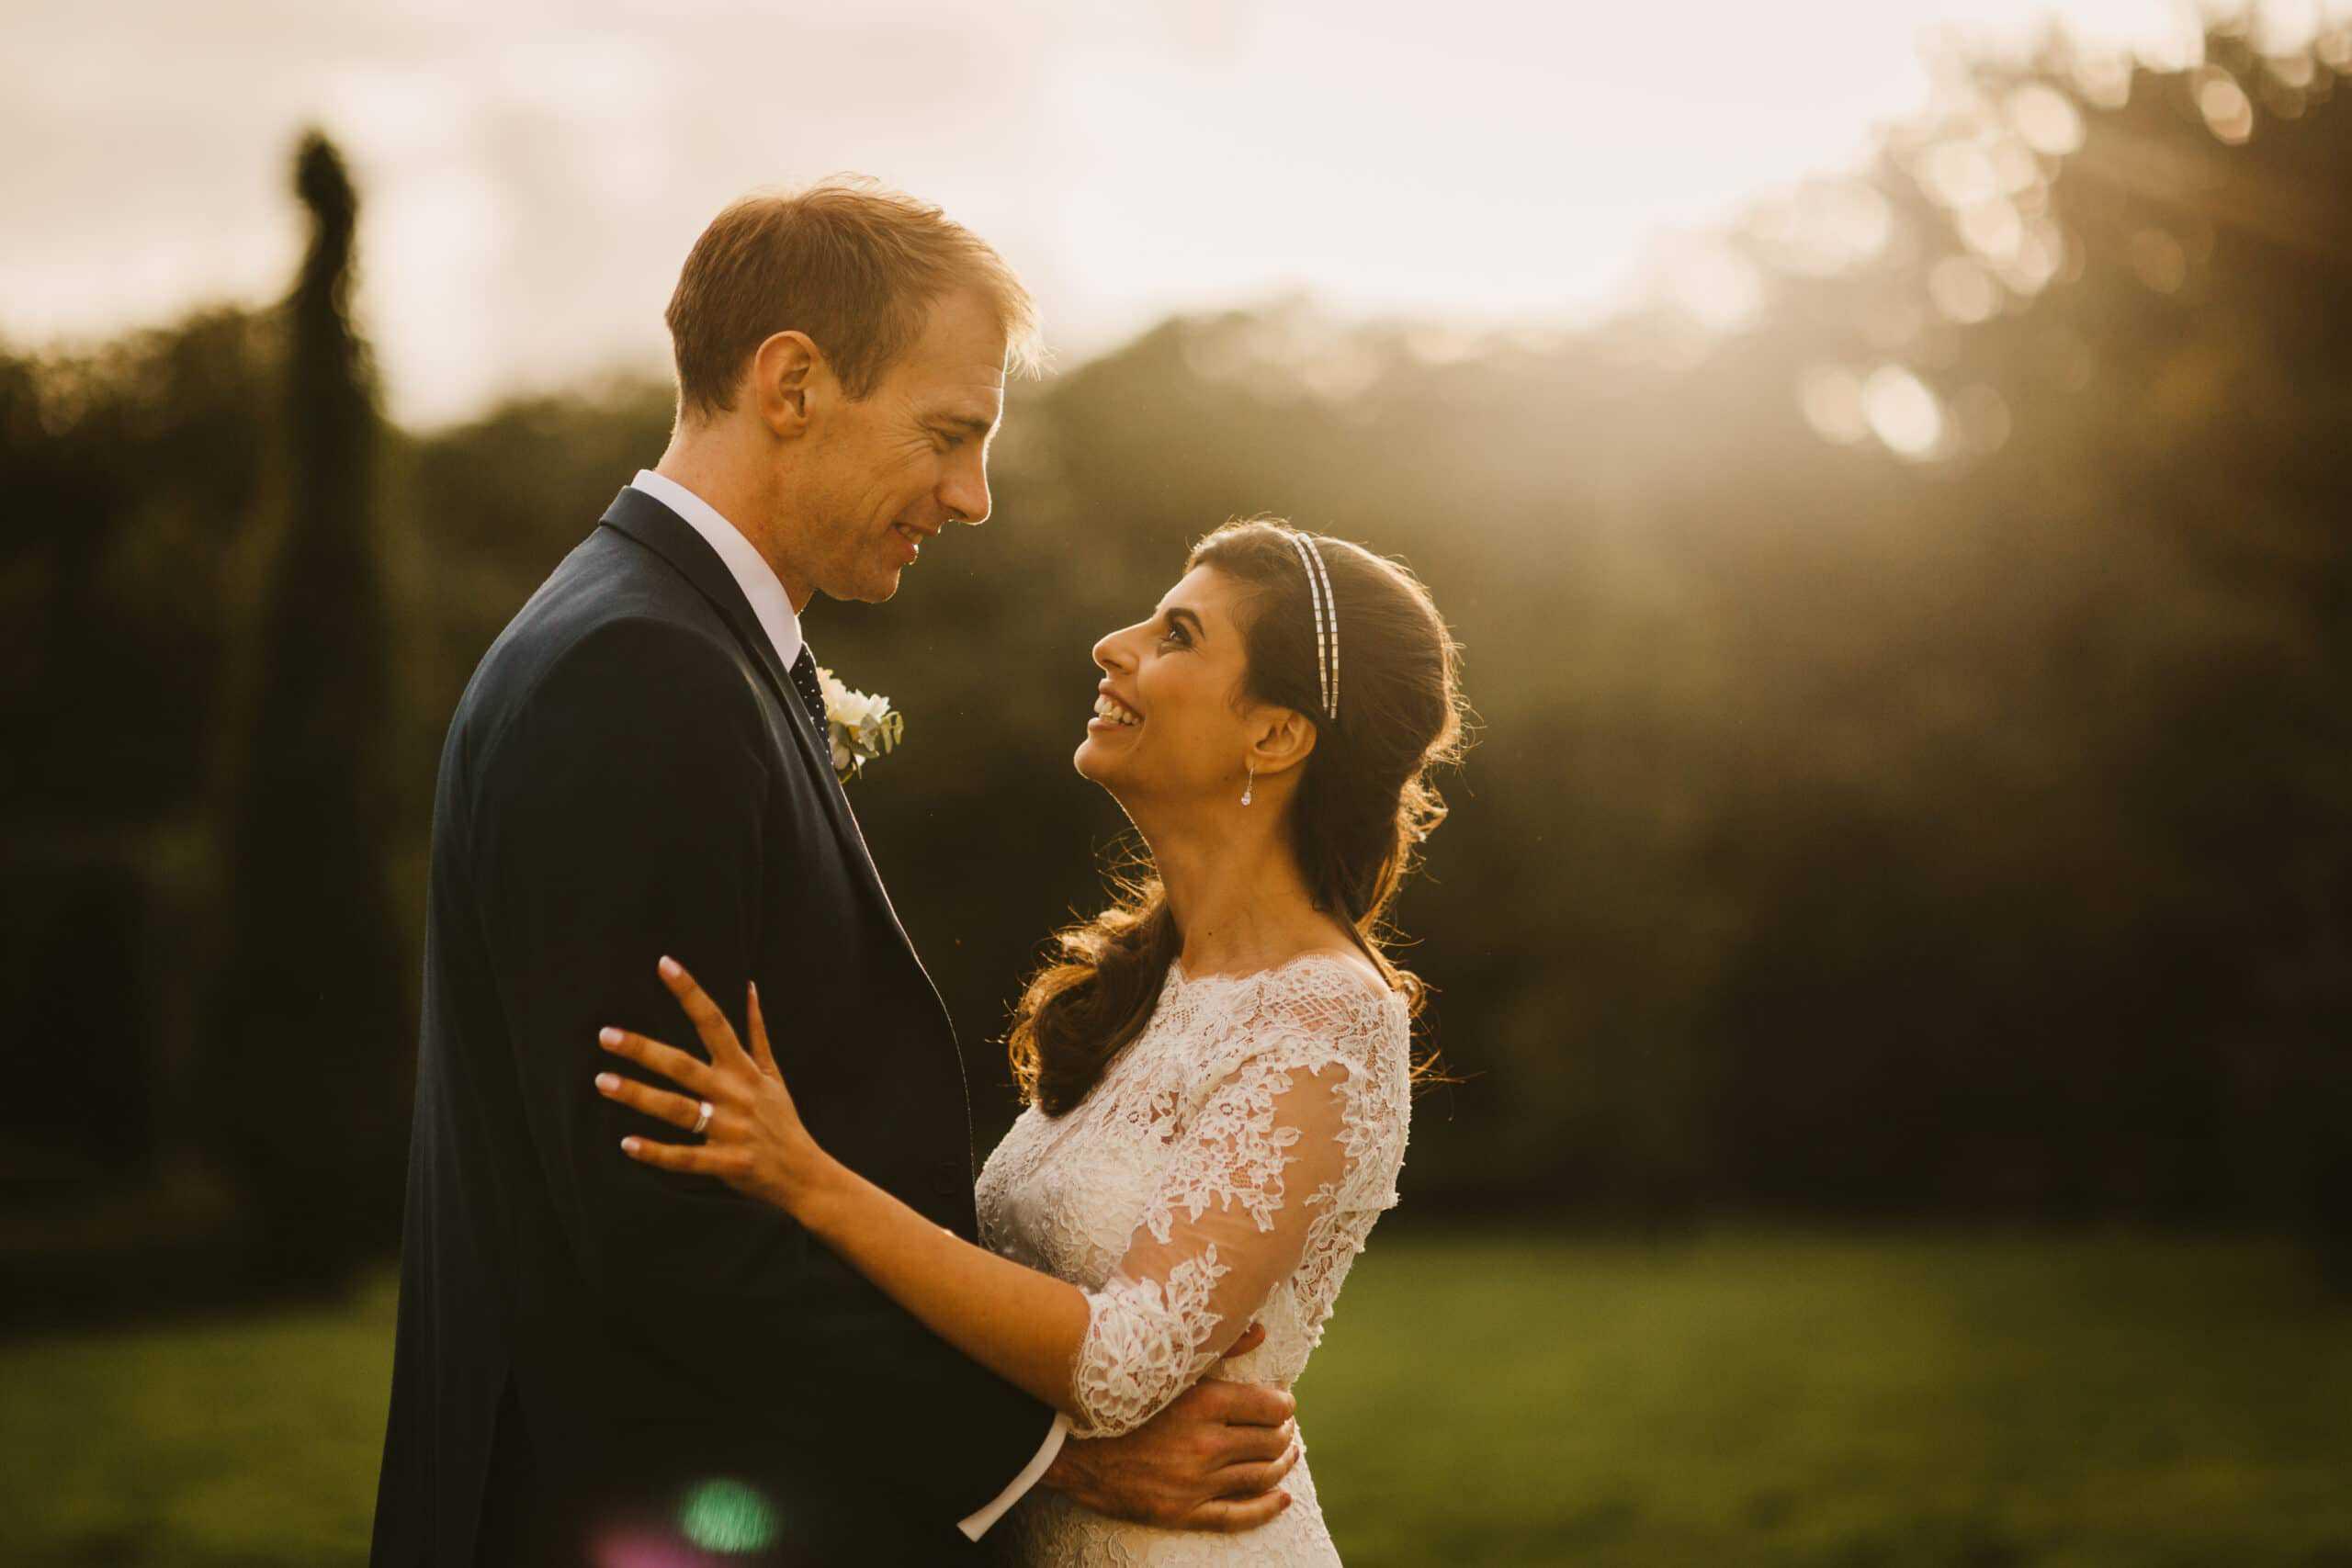 Castle Ireland Elopement Sunset Shoot after following Ireland marriage laws